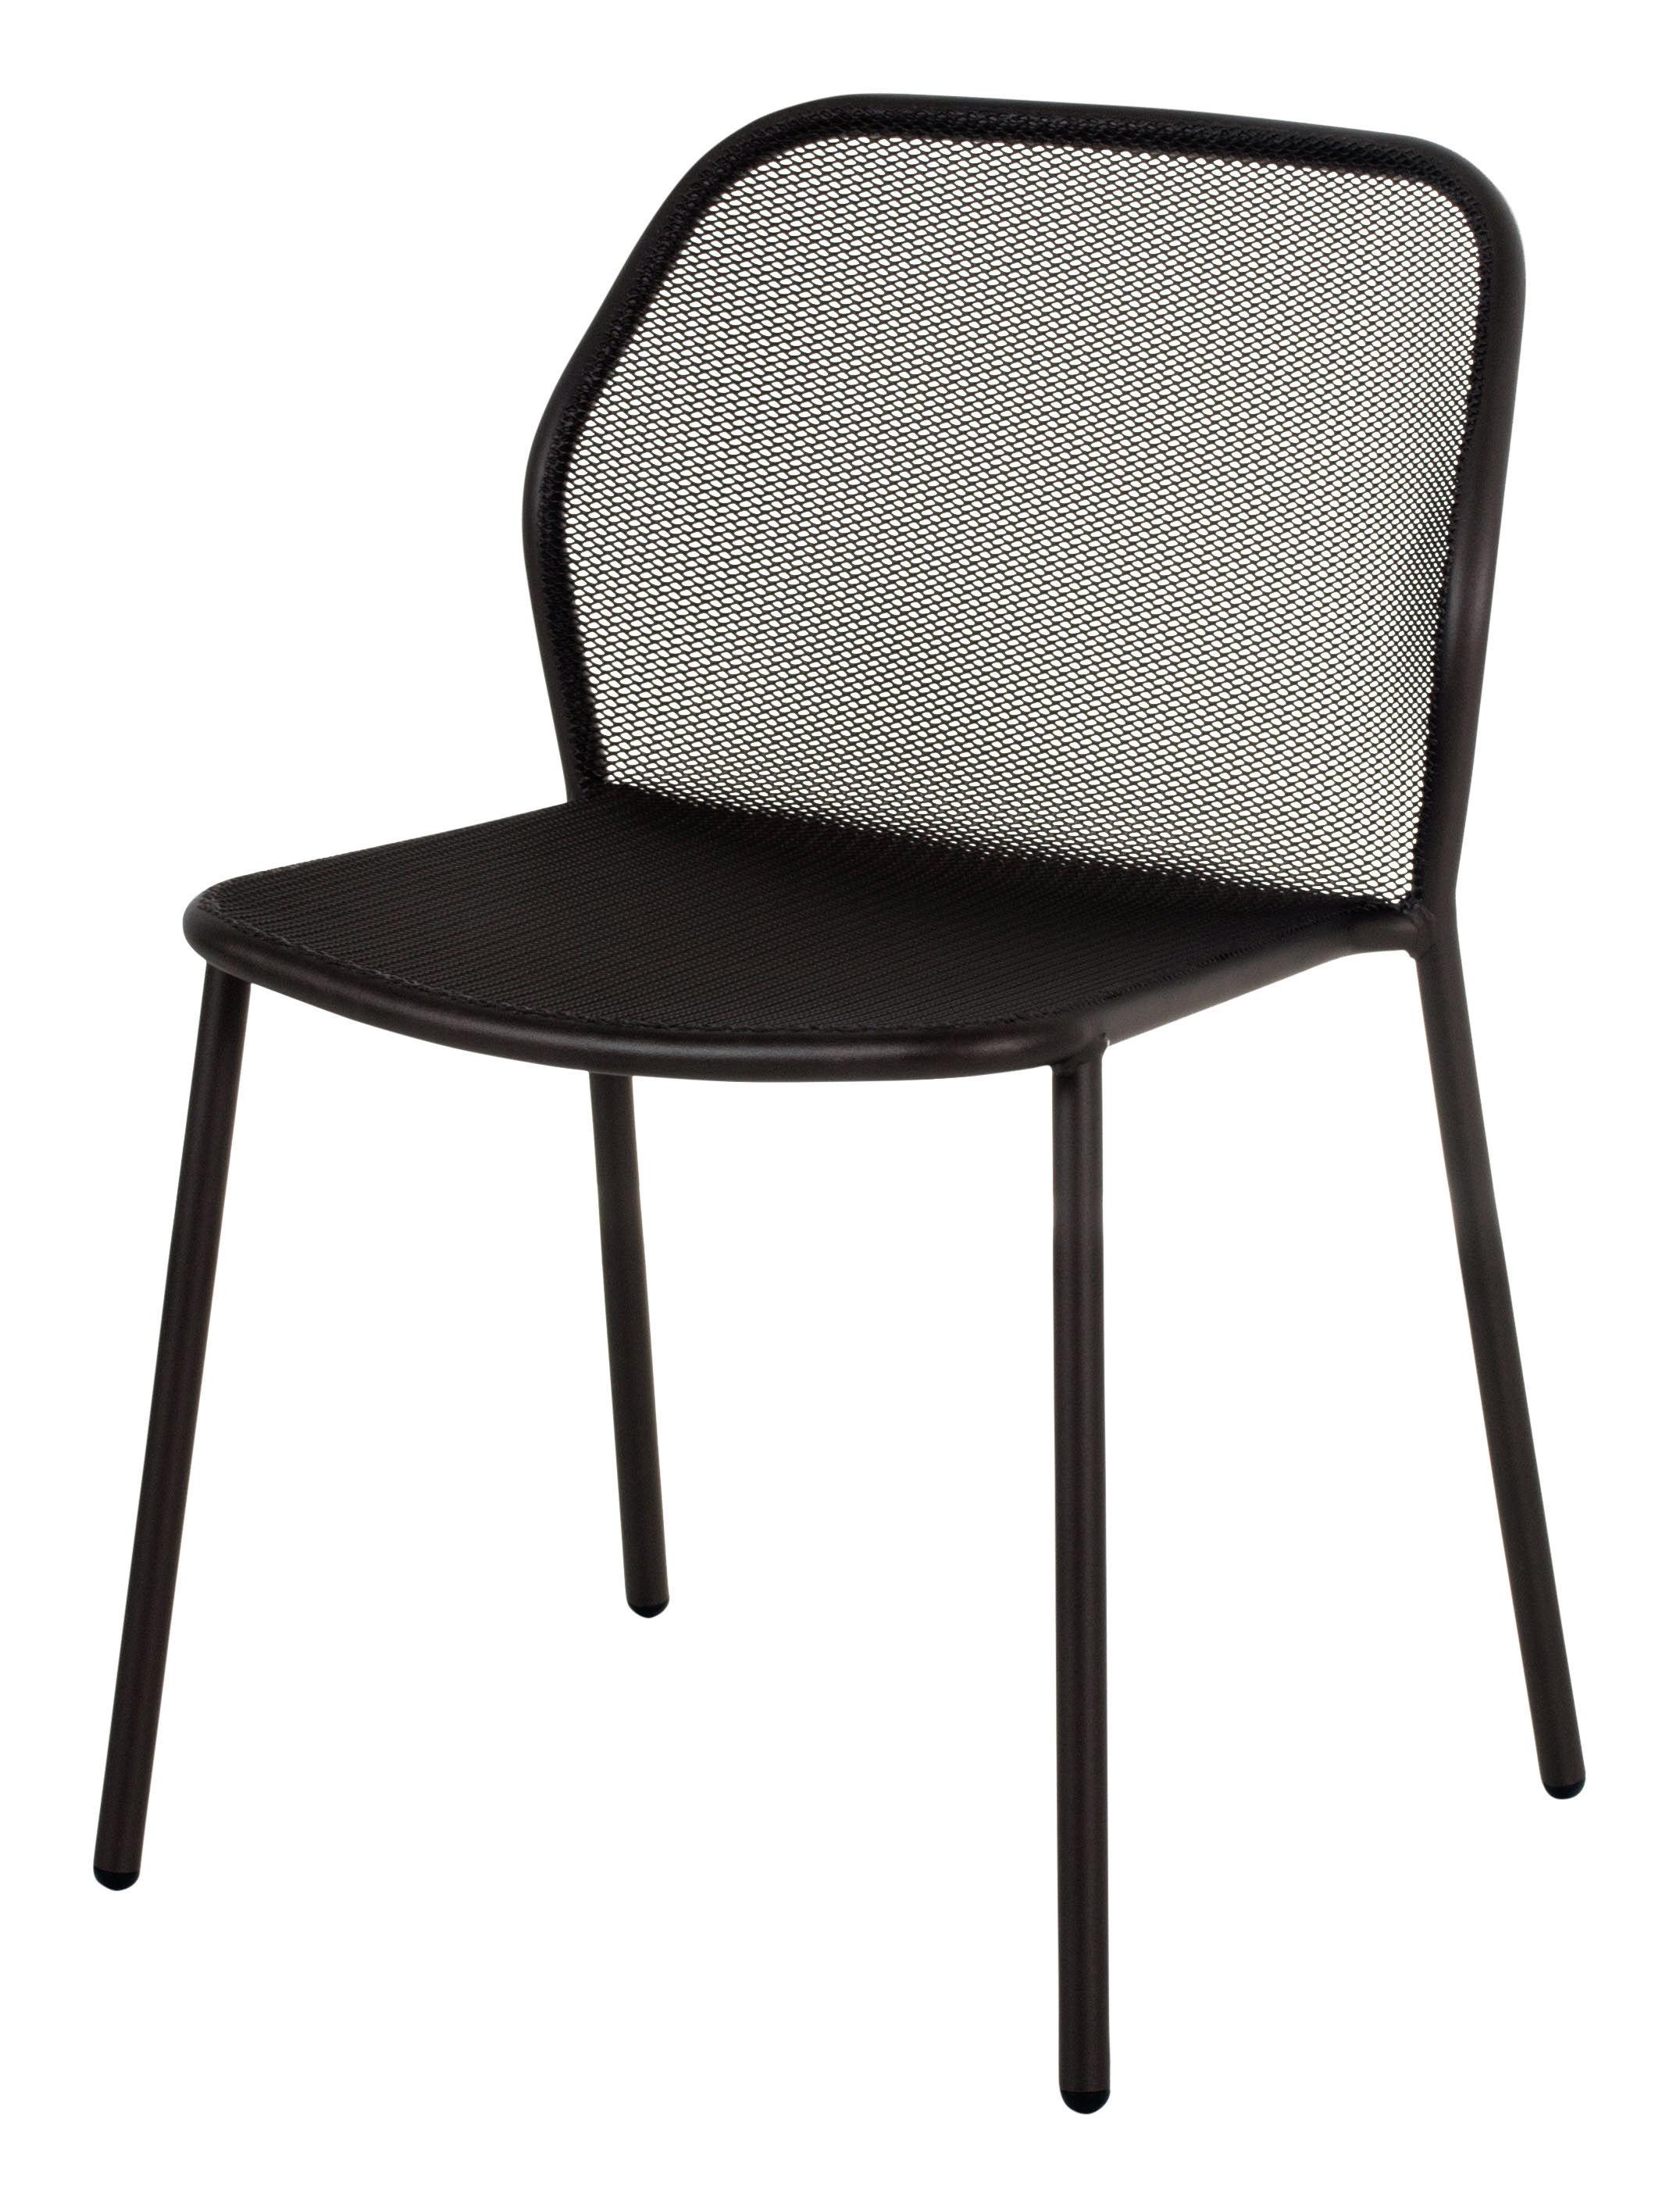 chaise empilable darwin m tal noir emu. Black Bedroom Furniture Sets. Home Design Ideas